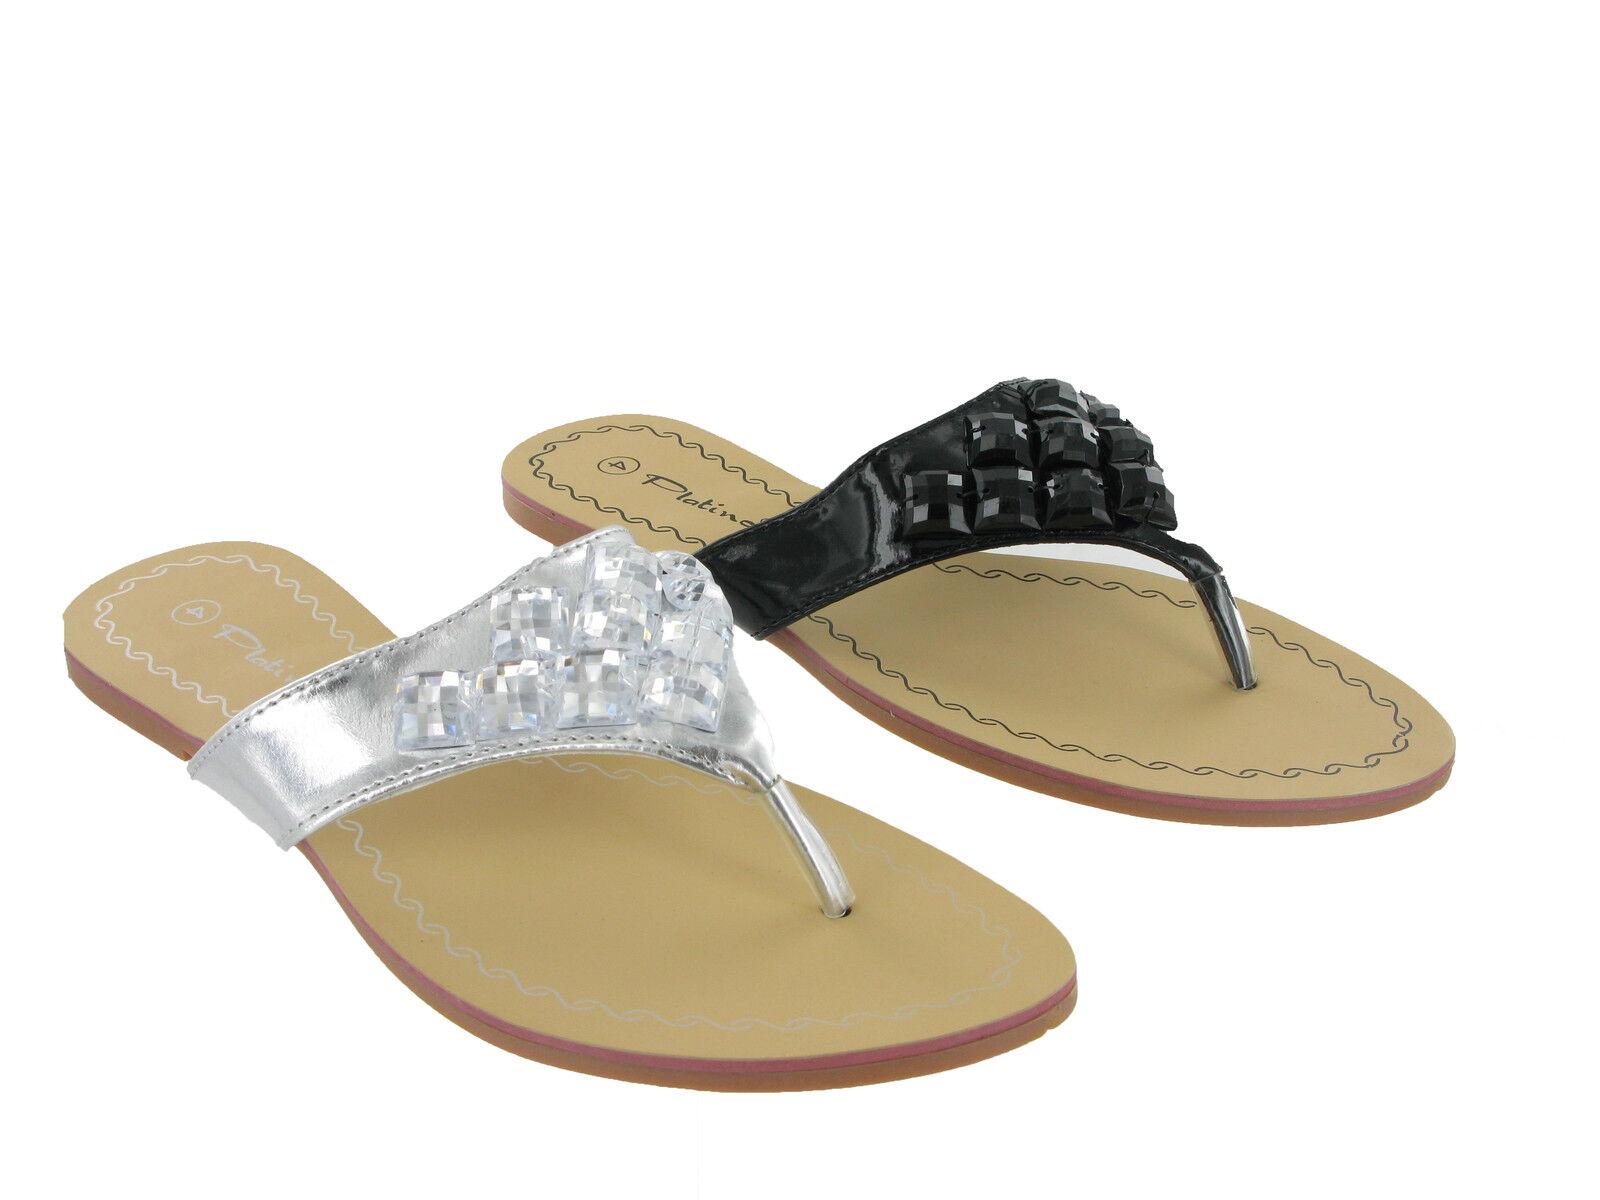 Fashion Summer Flat Toe Post Black Sandals Silver Womens Girls Jewelled Sandals Black UK3-8 7c6699